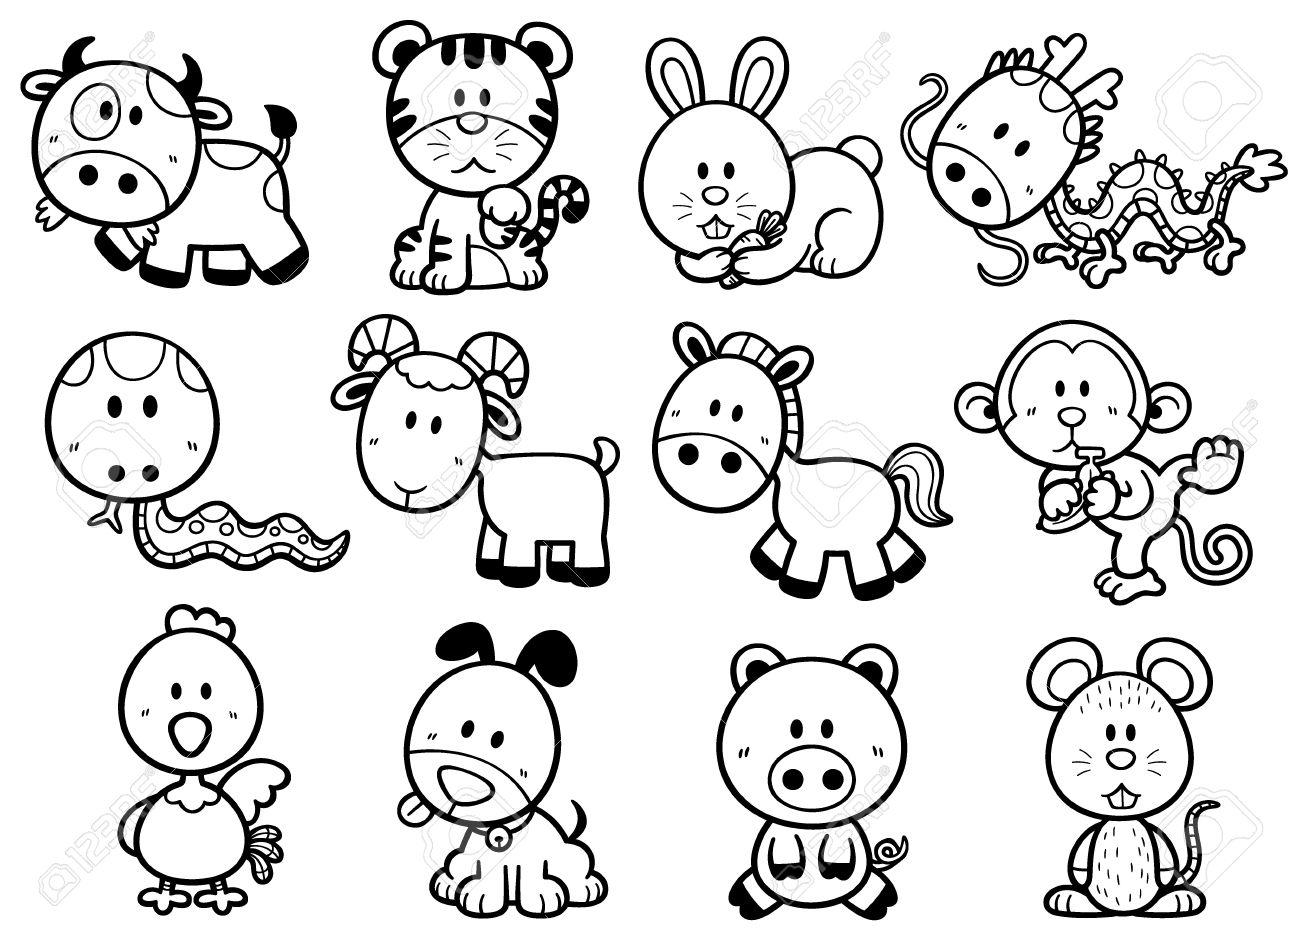 Vector Illustration Of Chinese Zodiac Animal Cartoon - Coloring ...